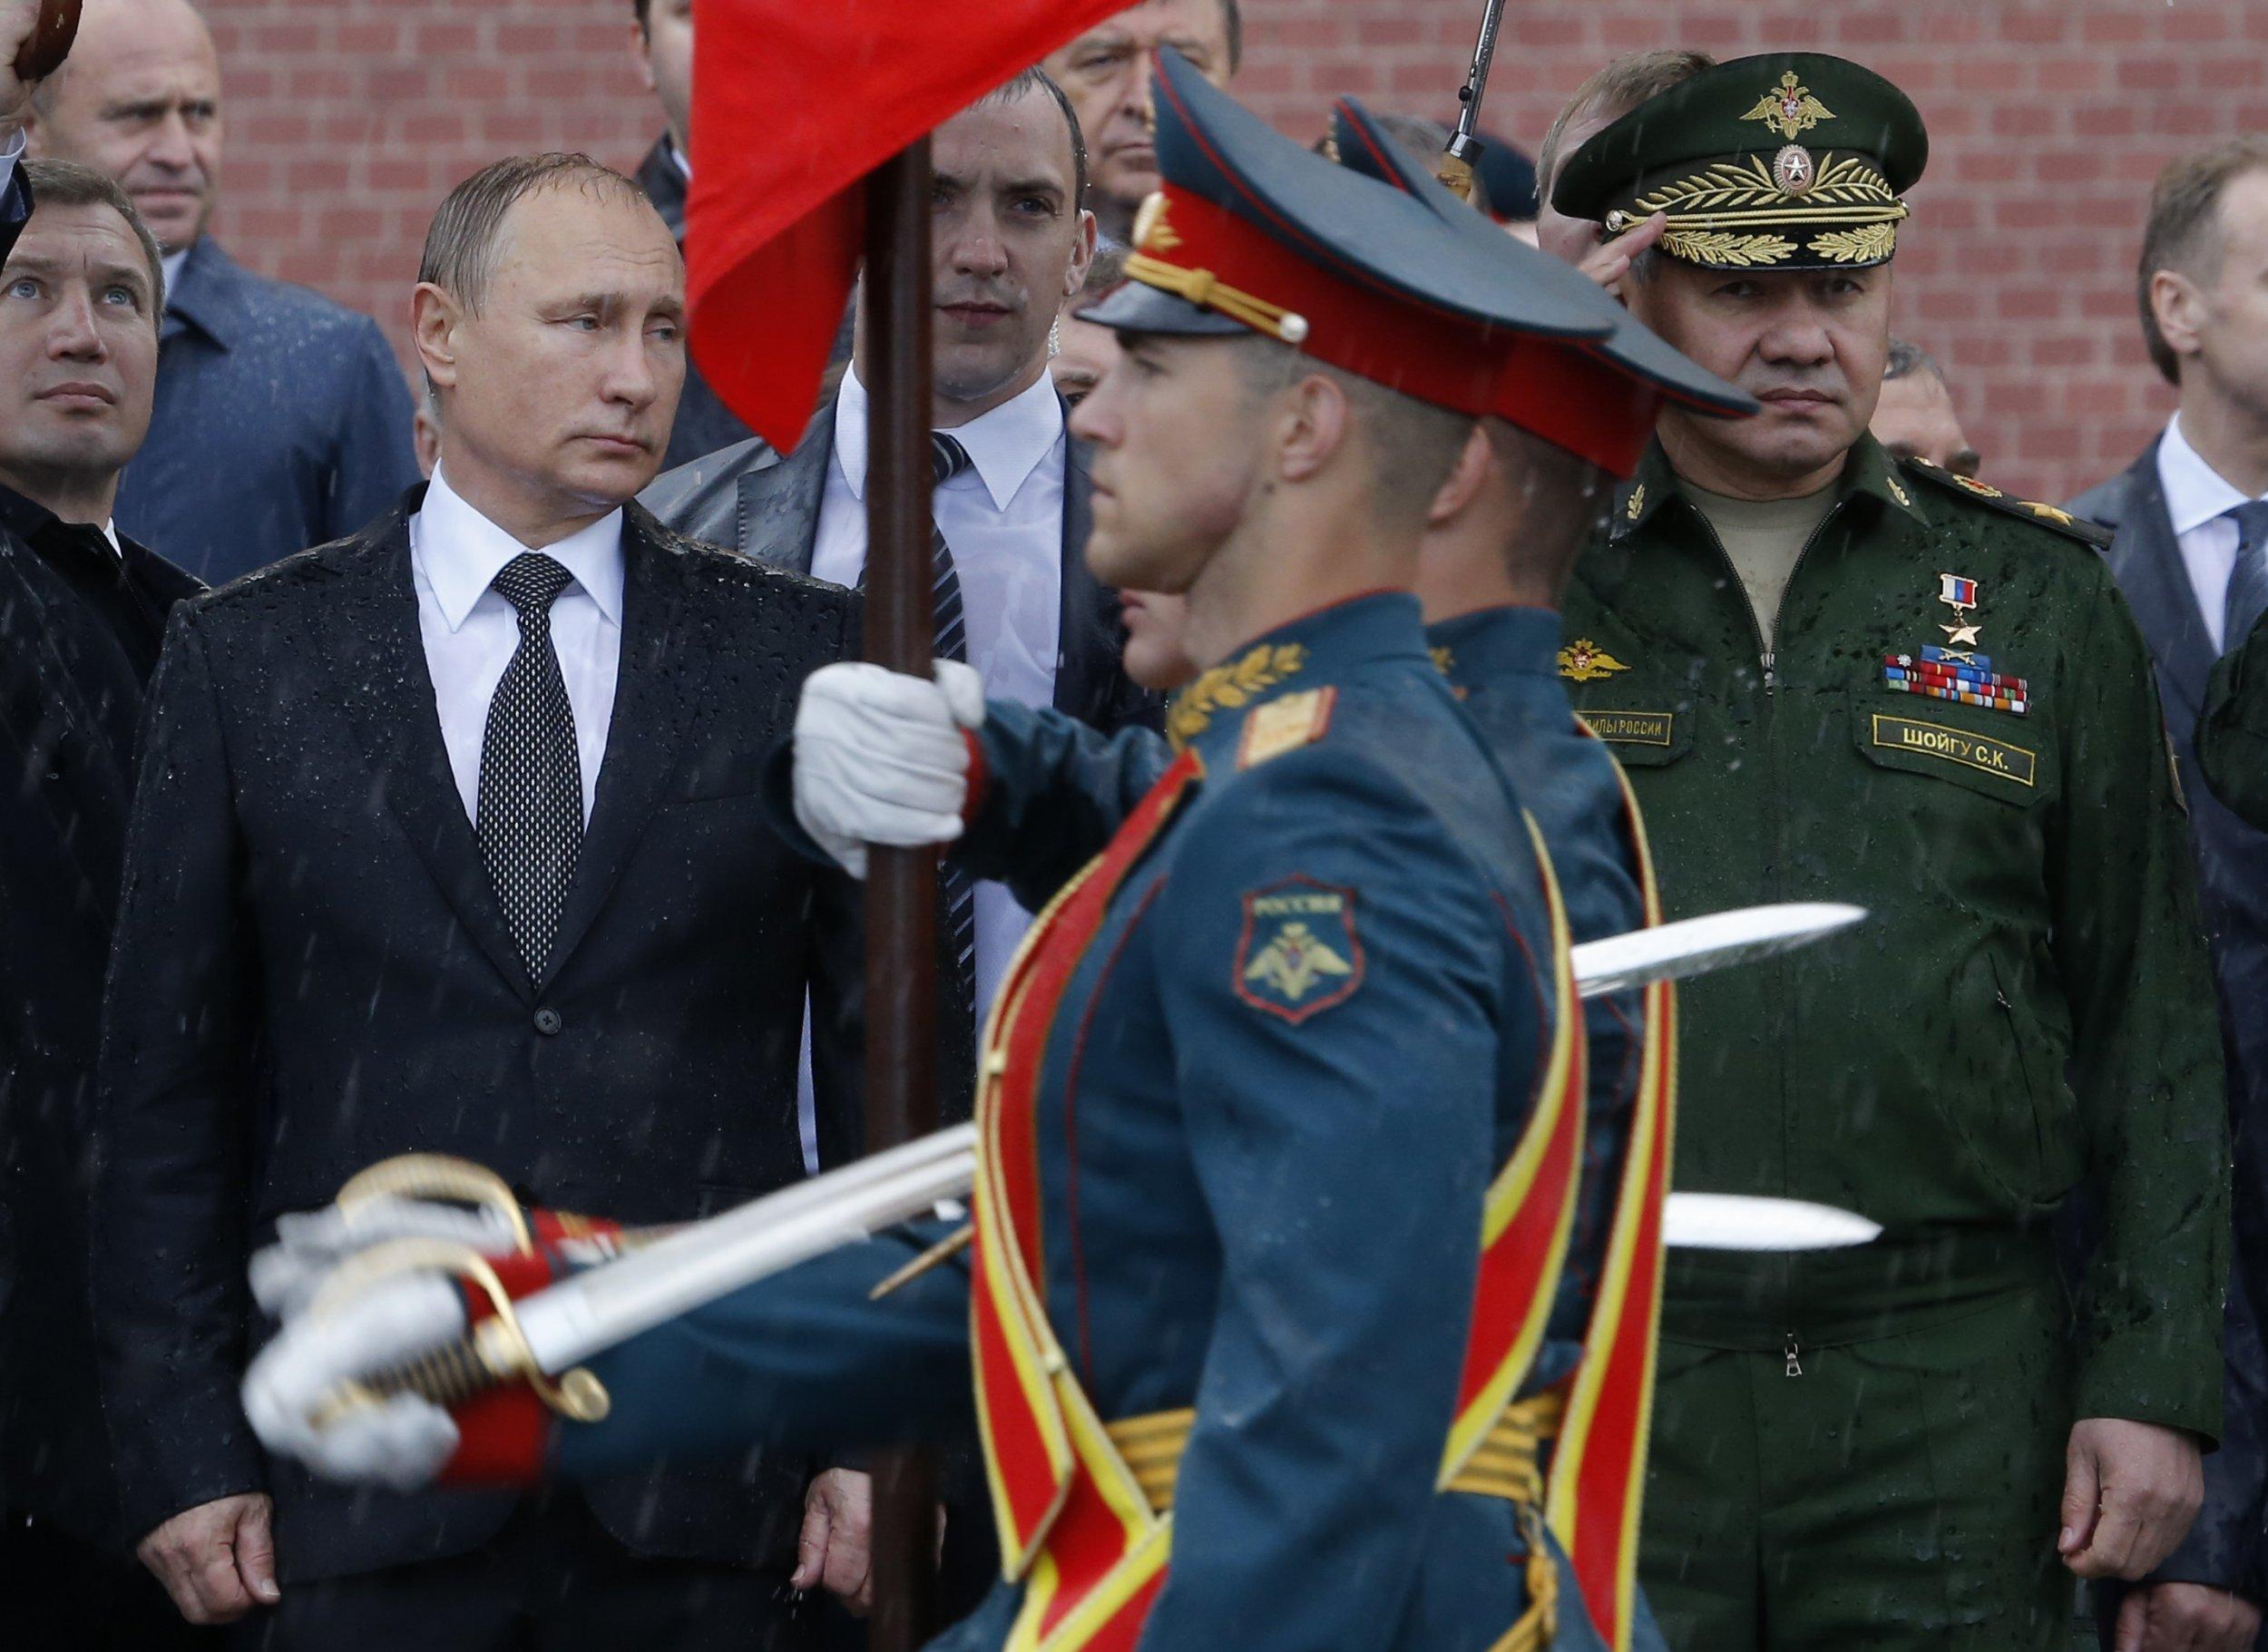 Putin and Shoigu